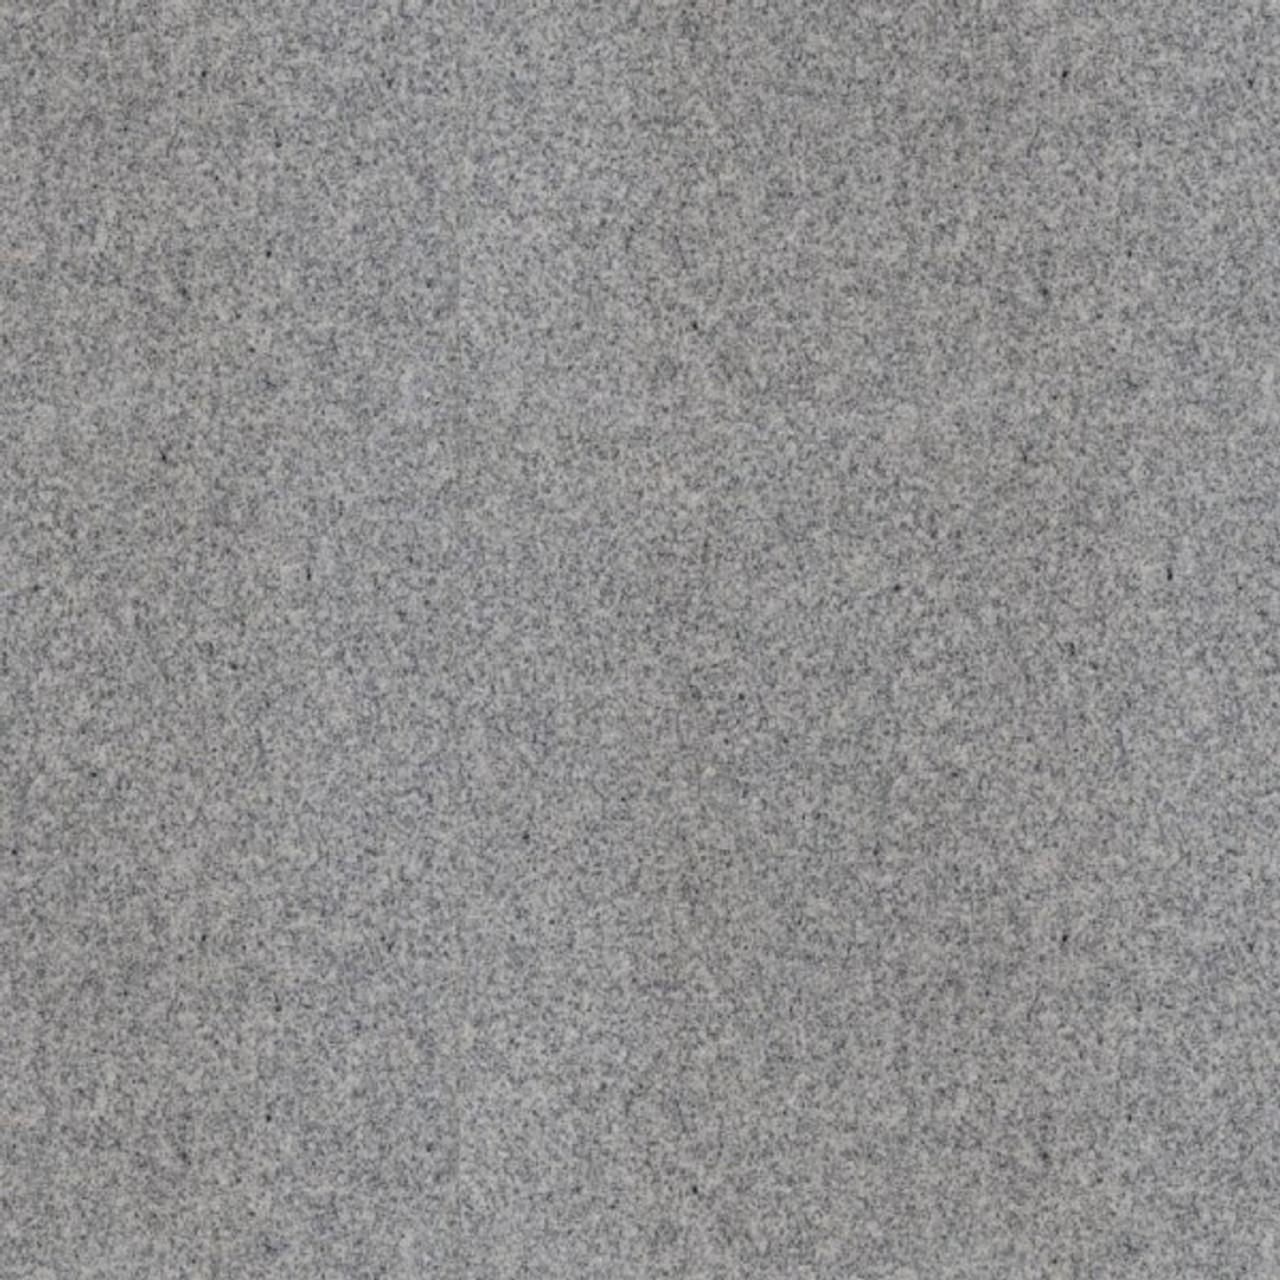 Elberton Gray Granite